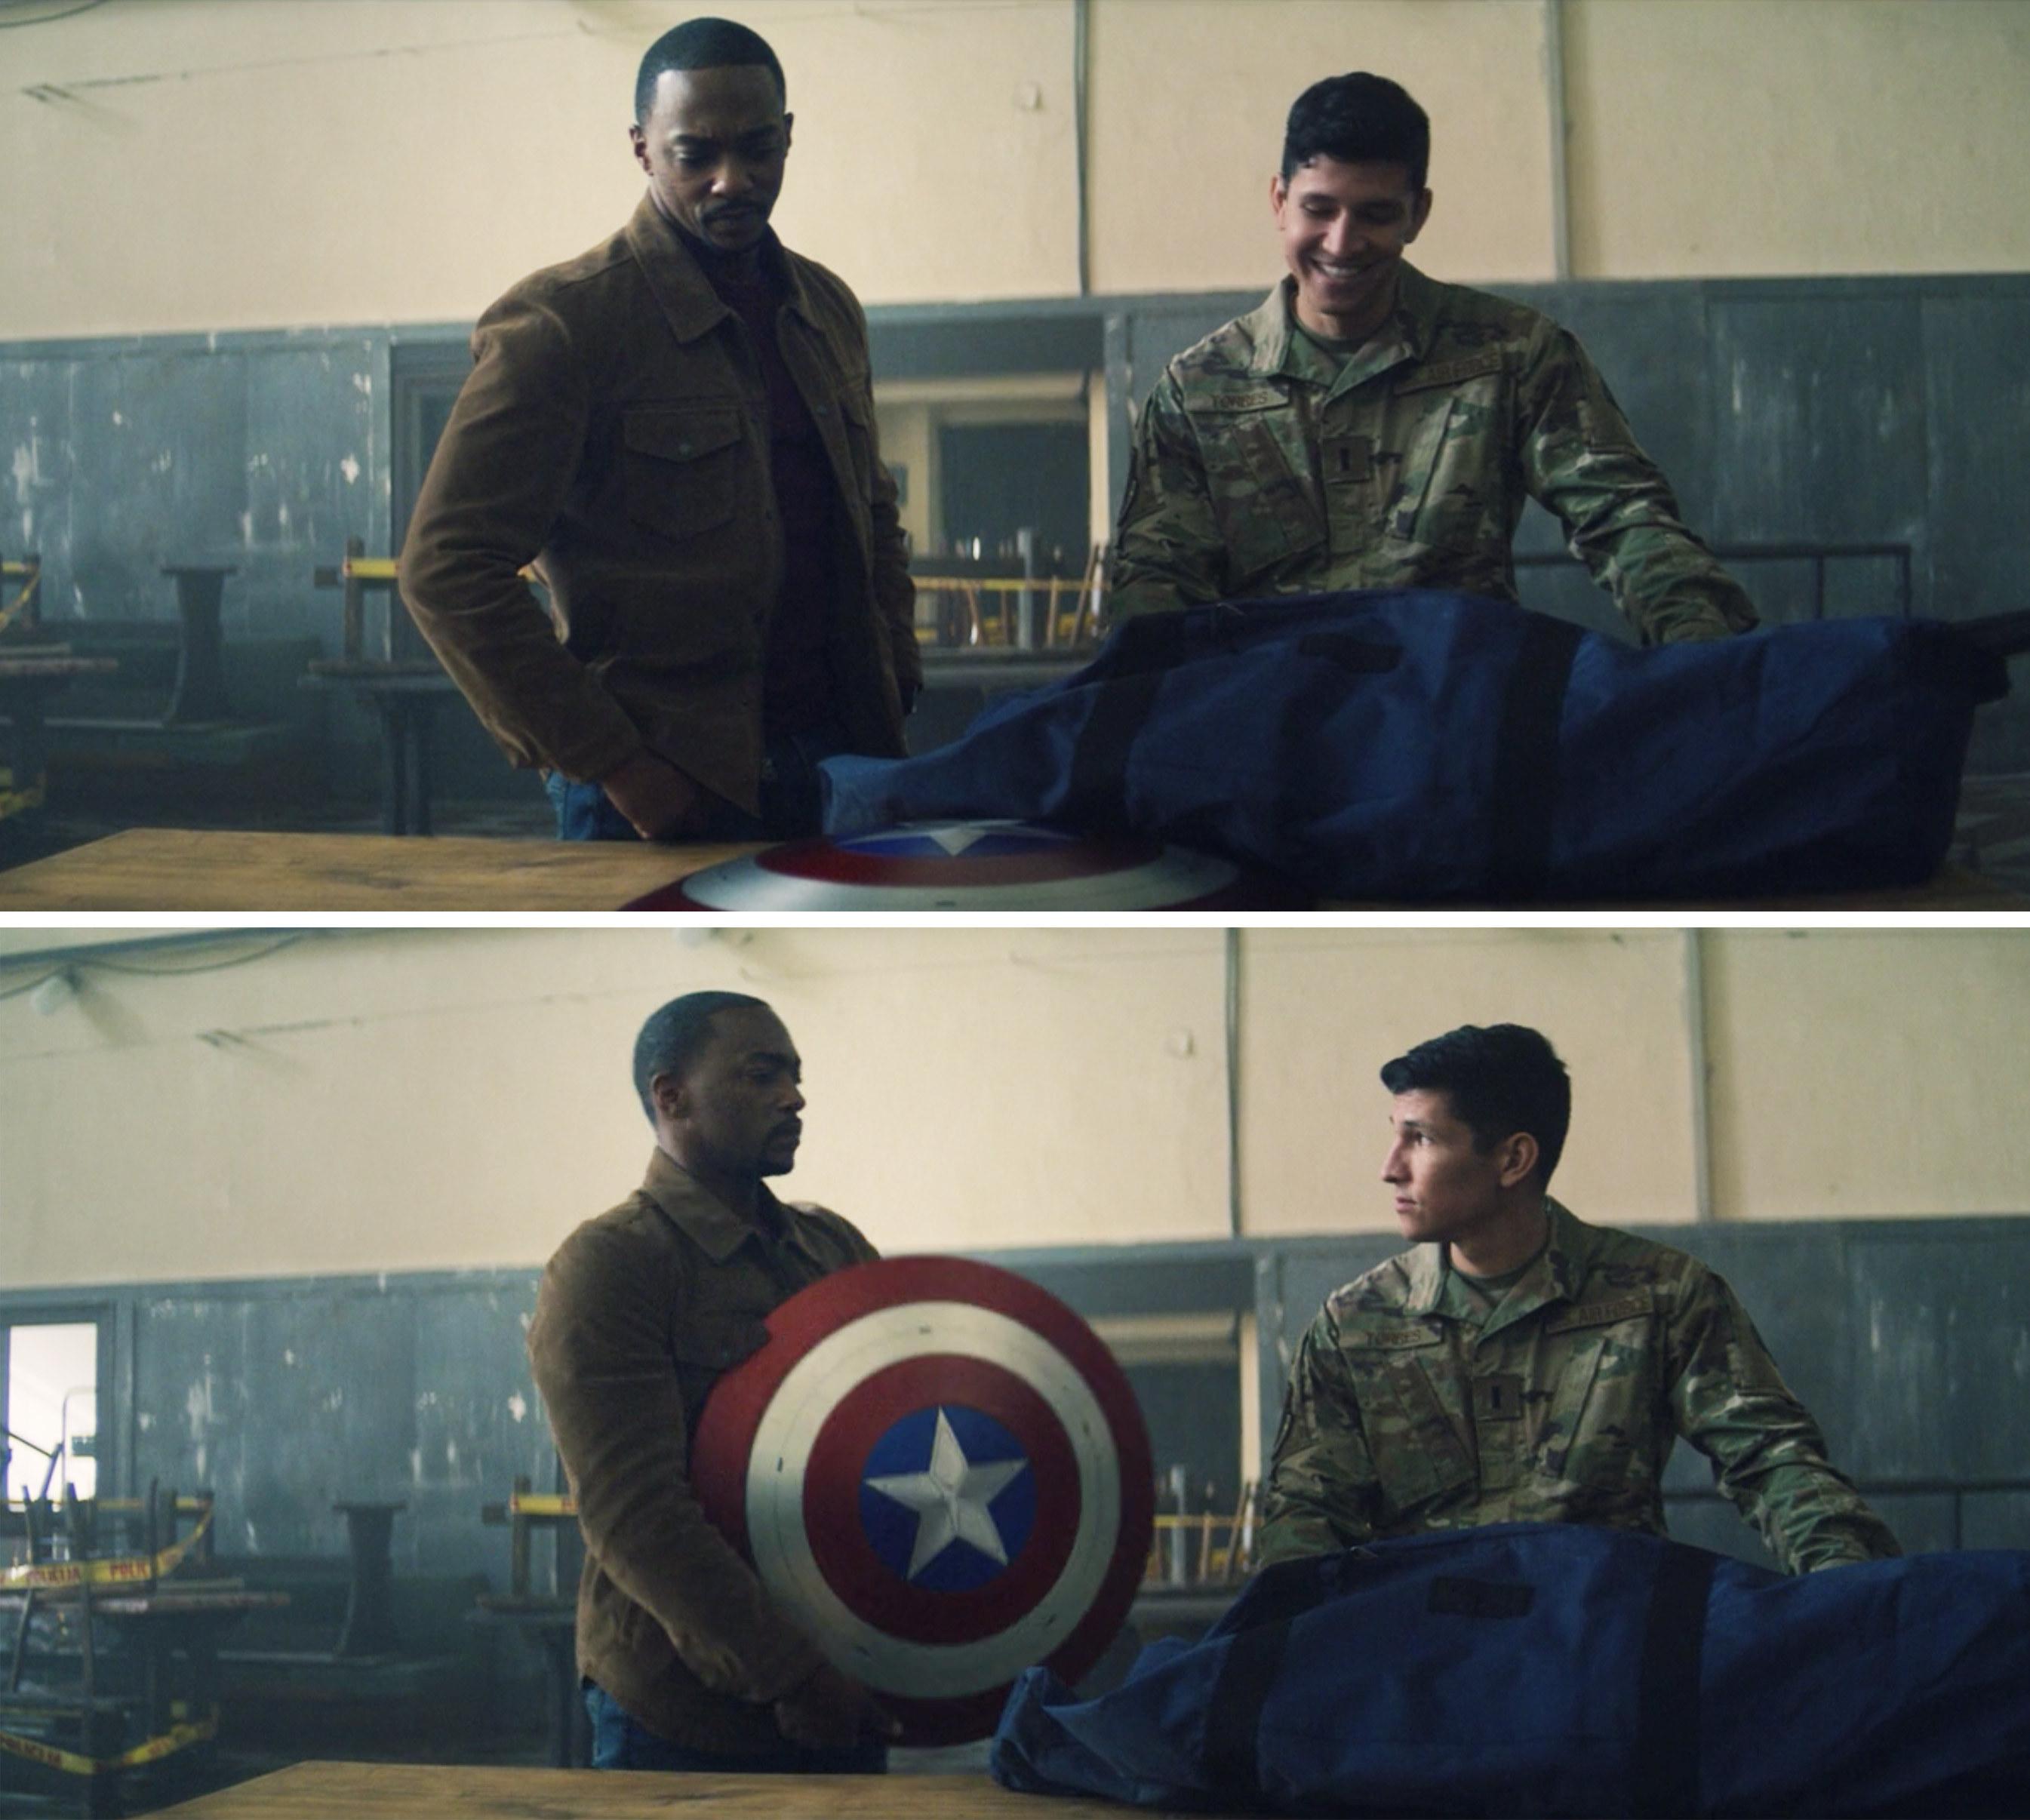 Sam holding the shield and Joaquin looking at him